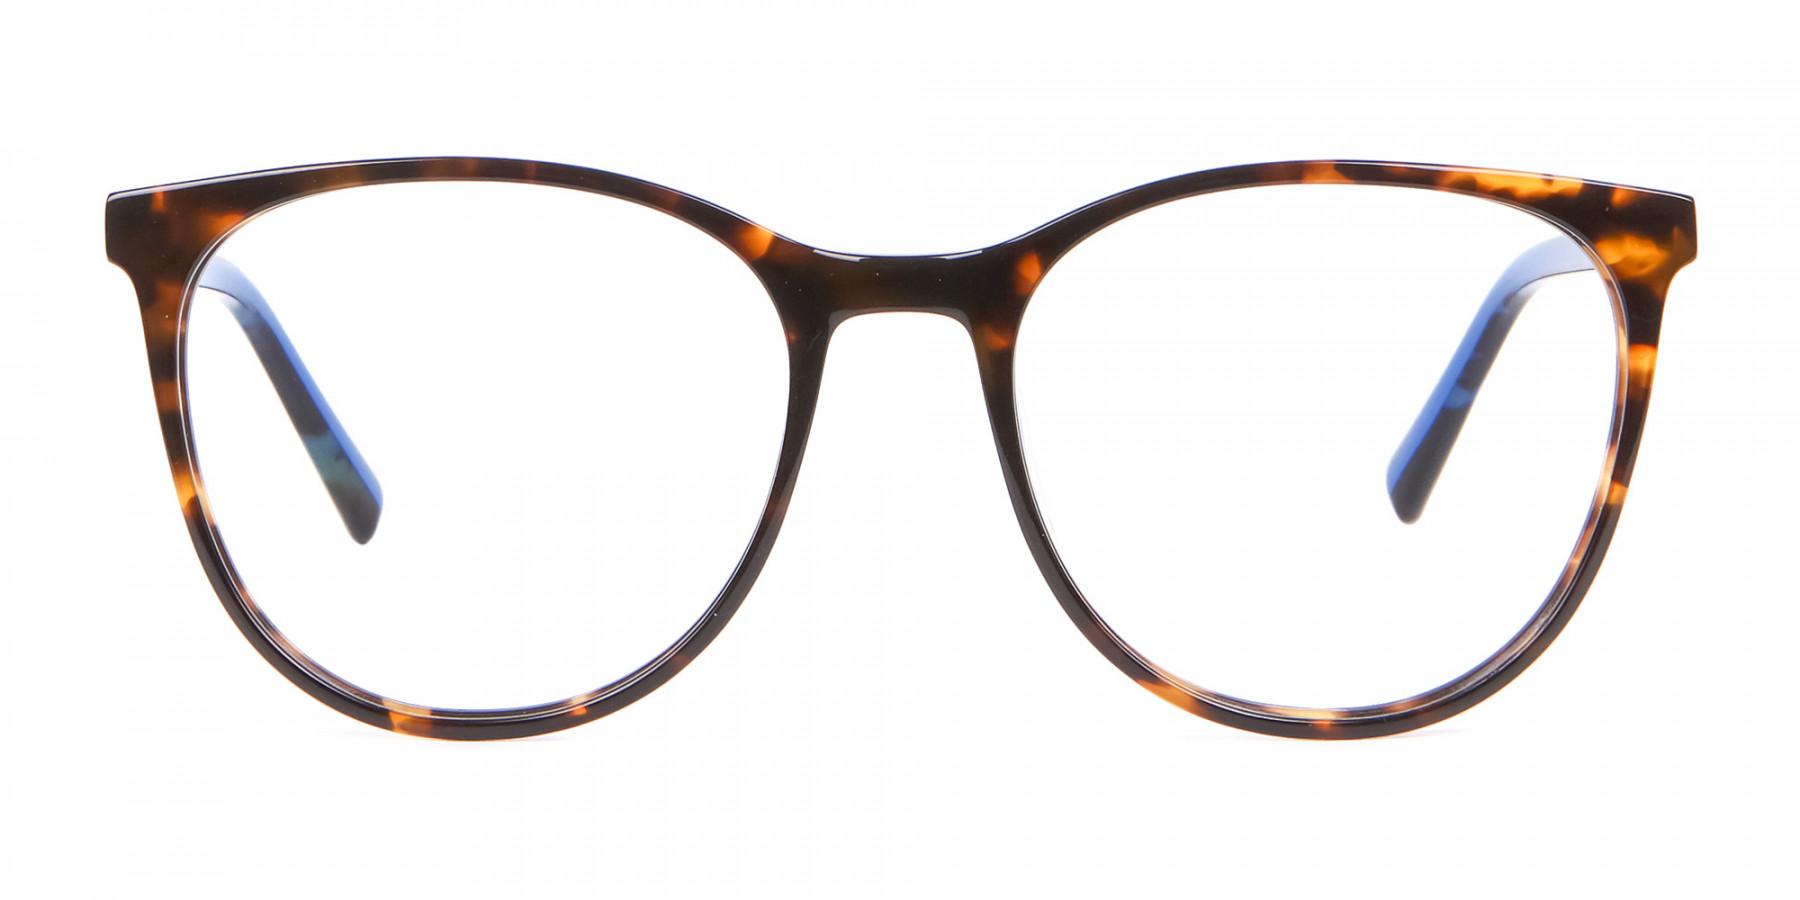 Fashion Round Frame in Tortoiseshell & Blue - 1